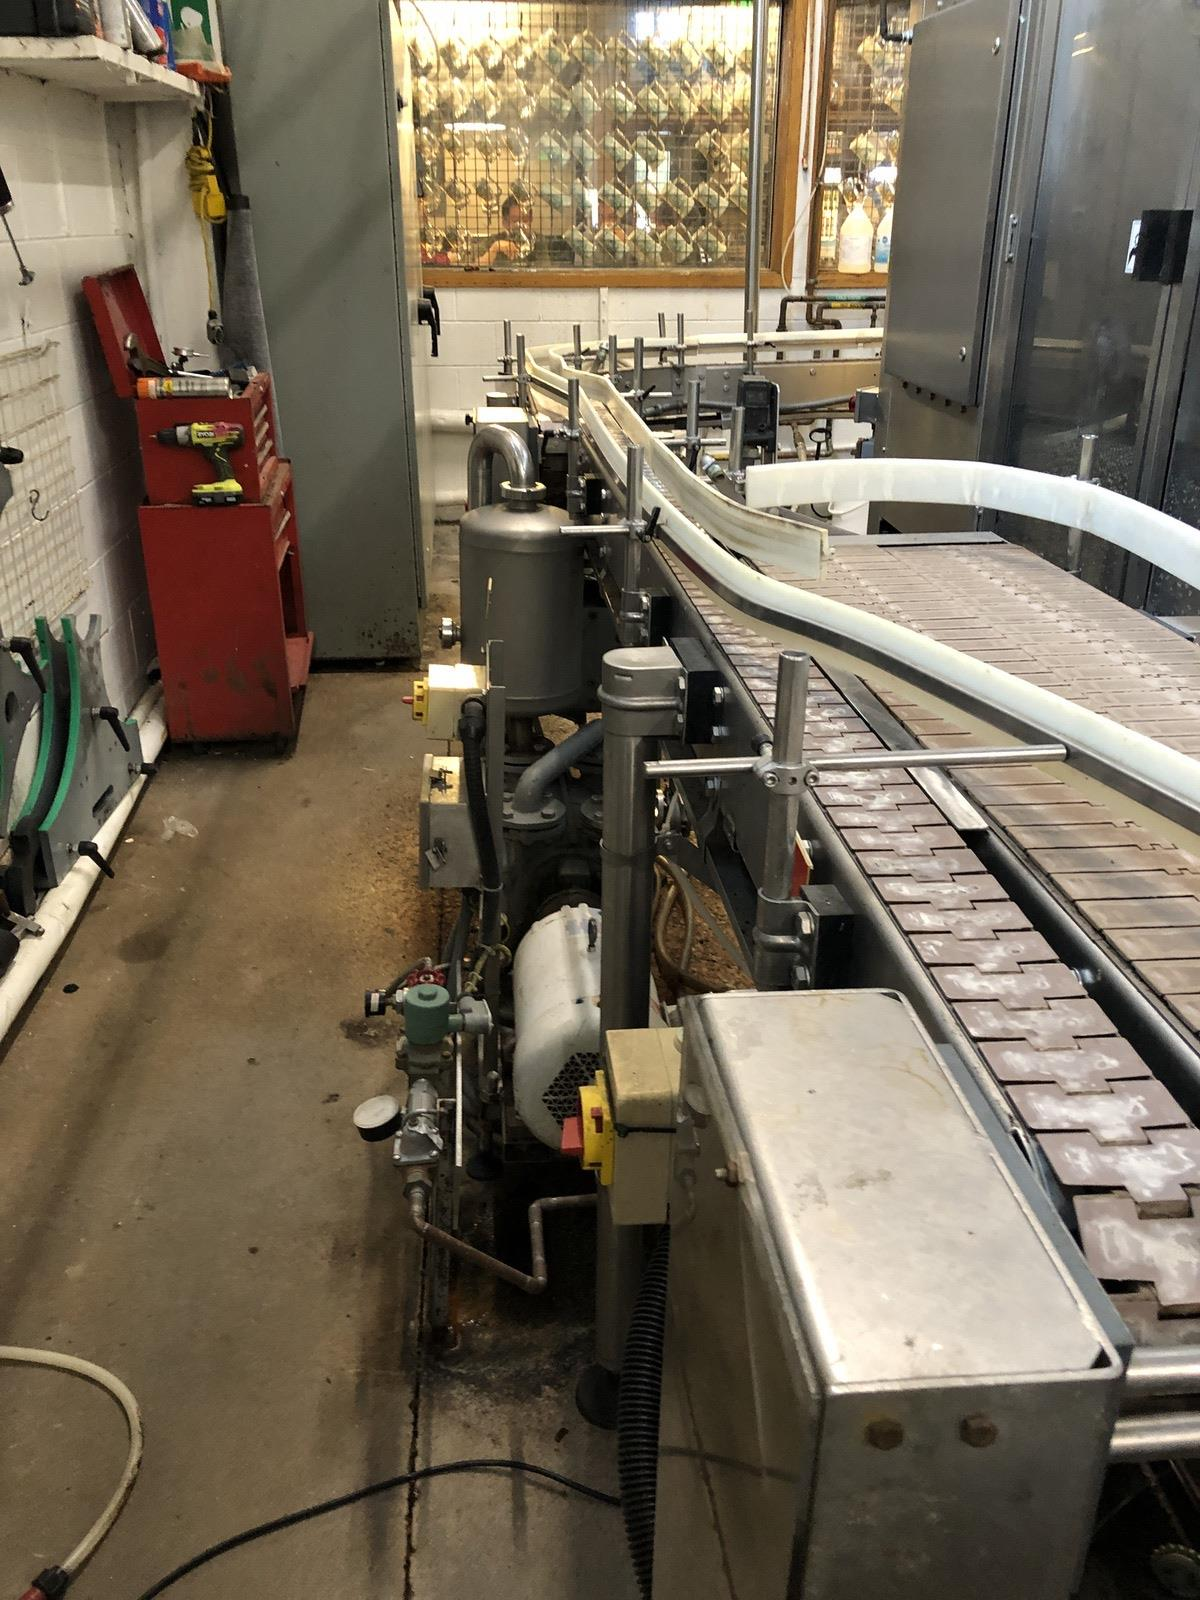 Lot 53 - Approx 22ft Bottle Conveyor, Floor Mounted, (2) 90 Deg | Sub to Bulk | Rig Fee: $250